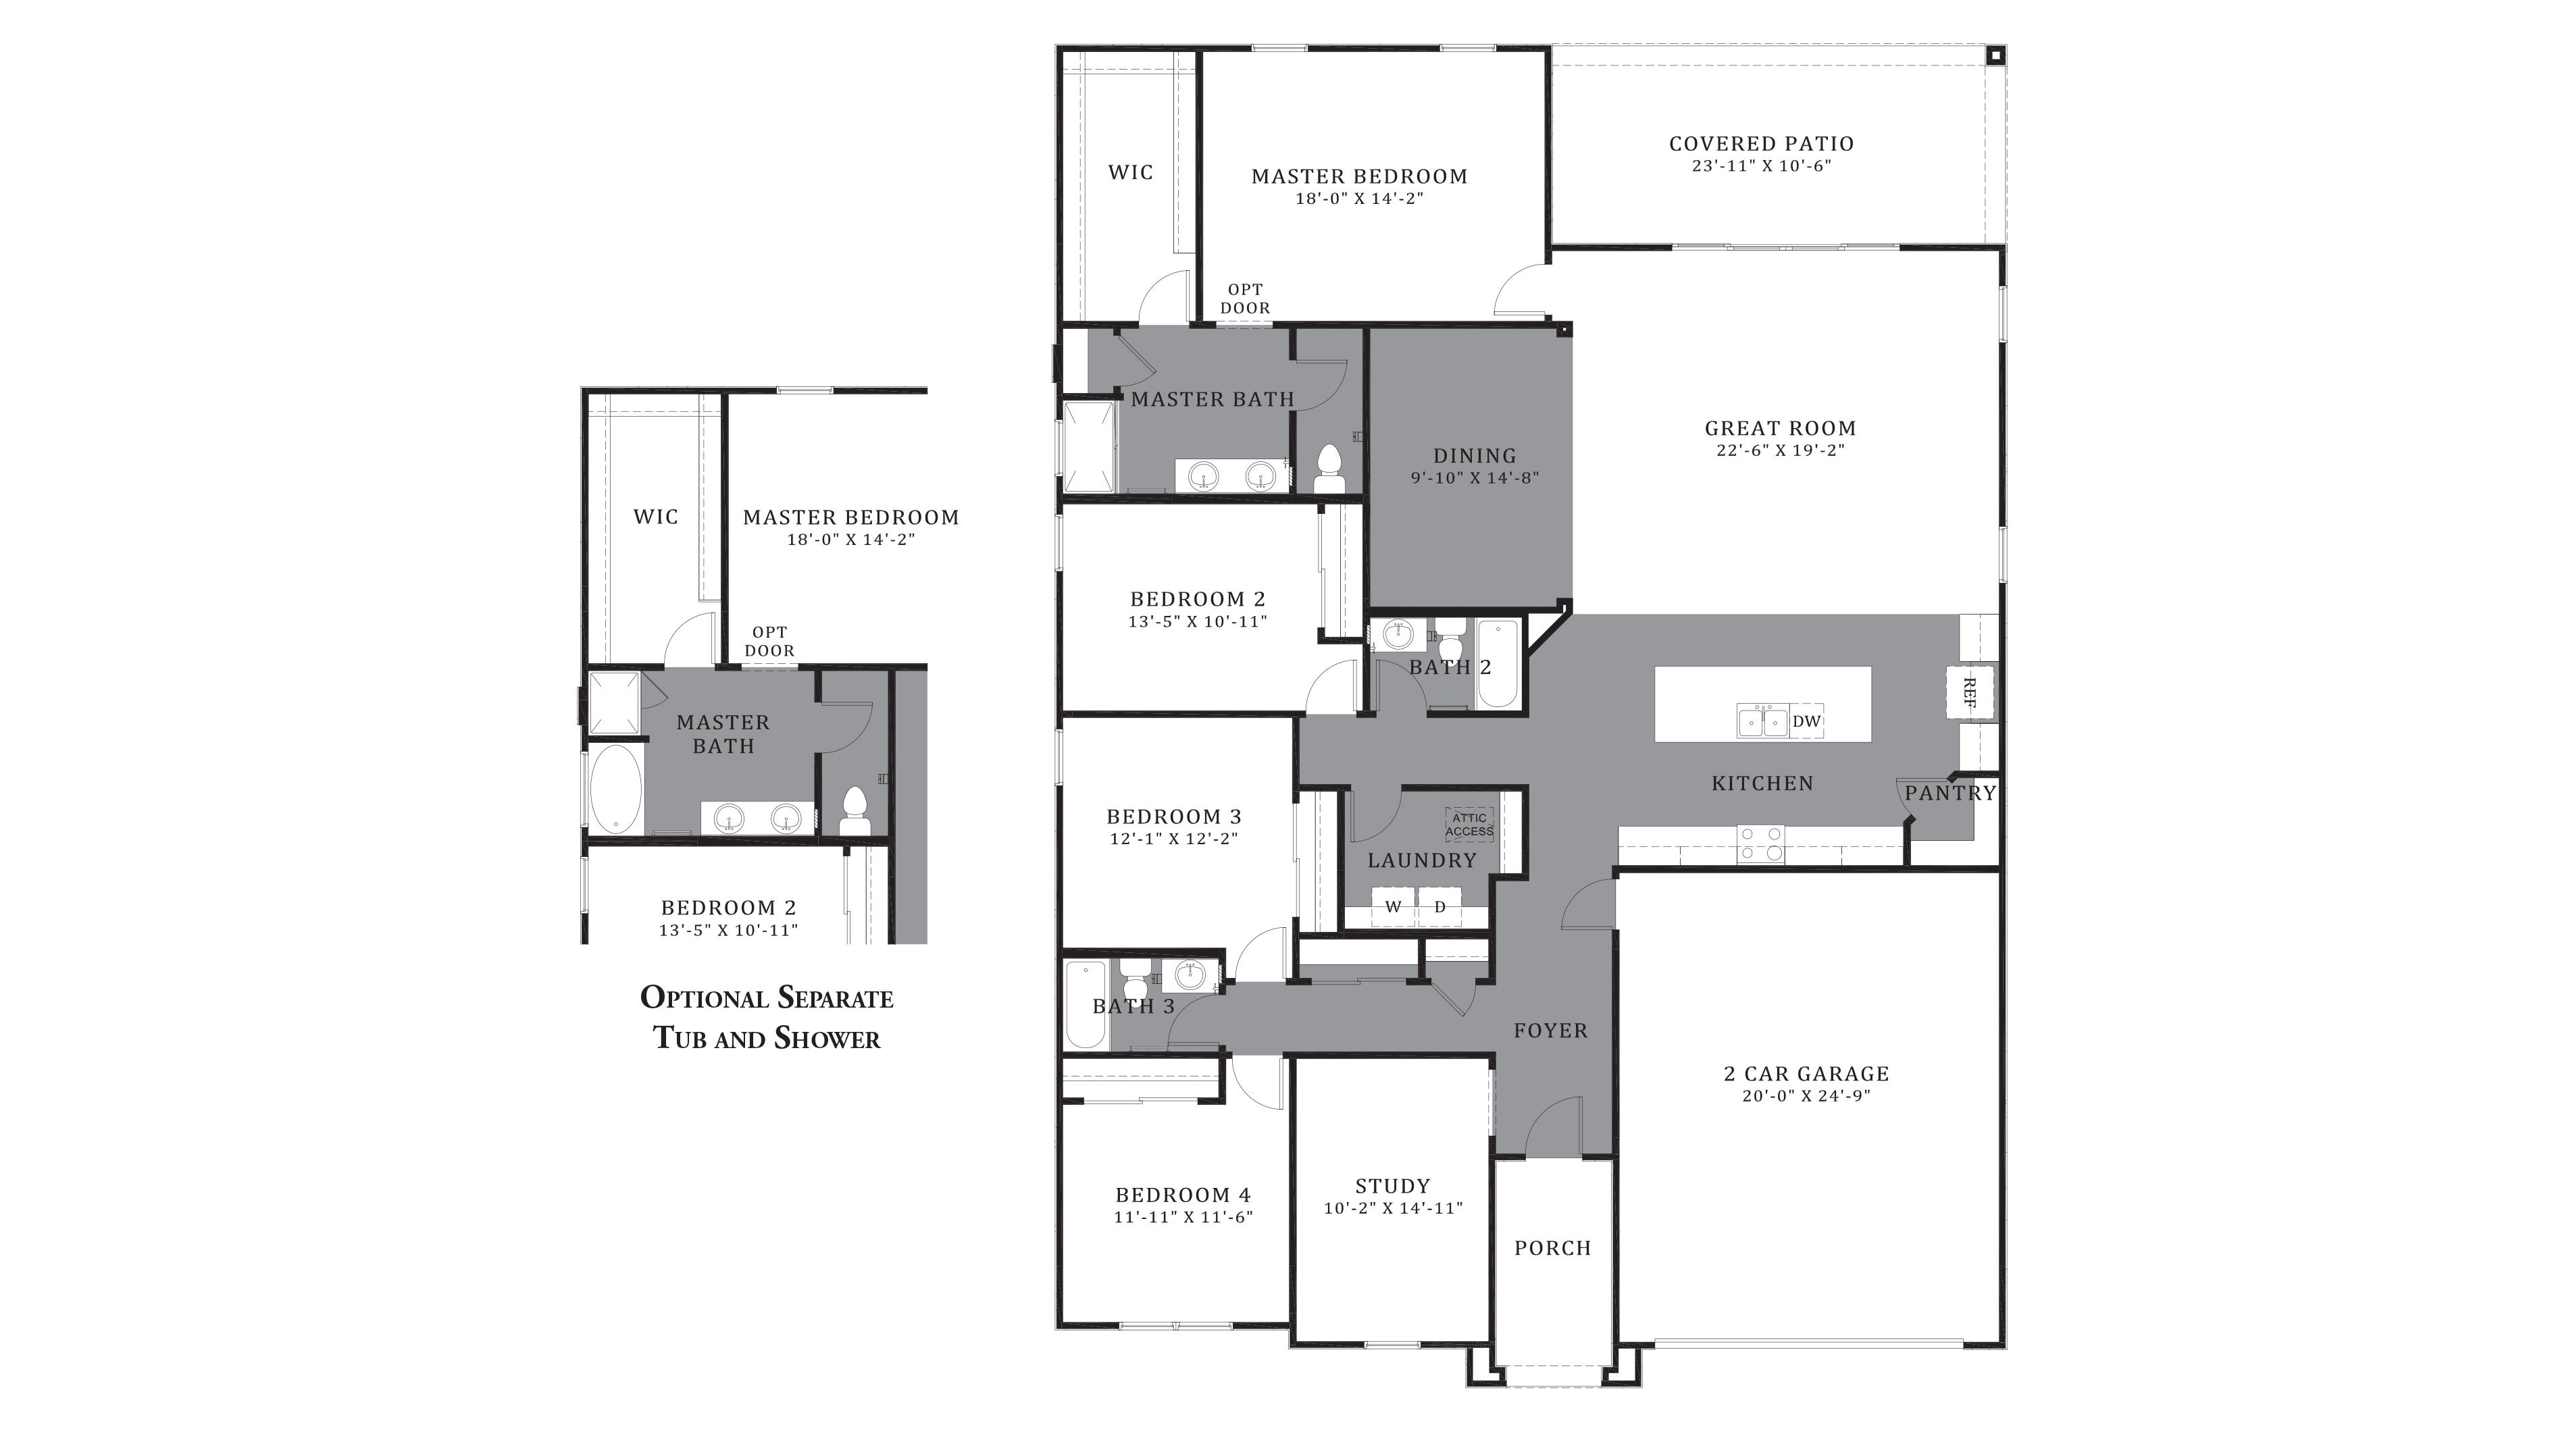 D.R. Horton Santa Cruz Meadows Citrine - Plan 5042 Floor Plan